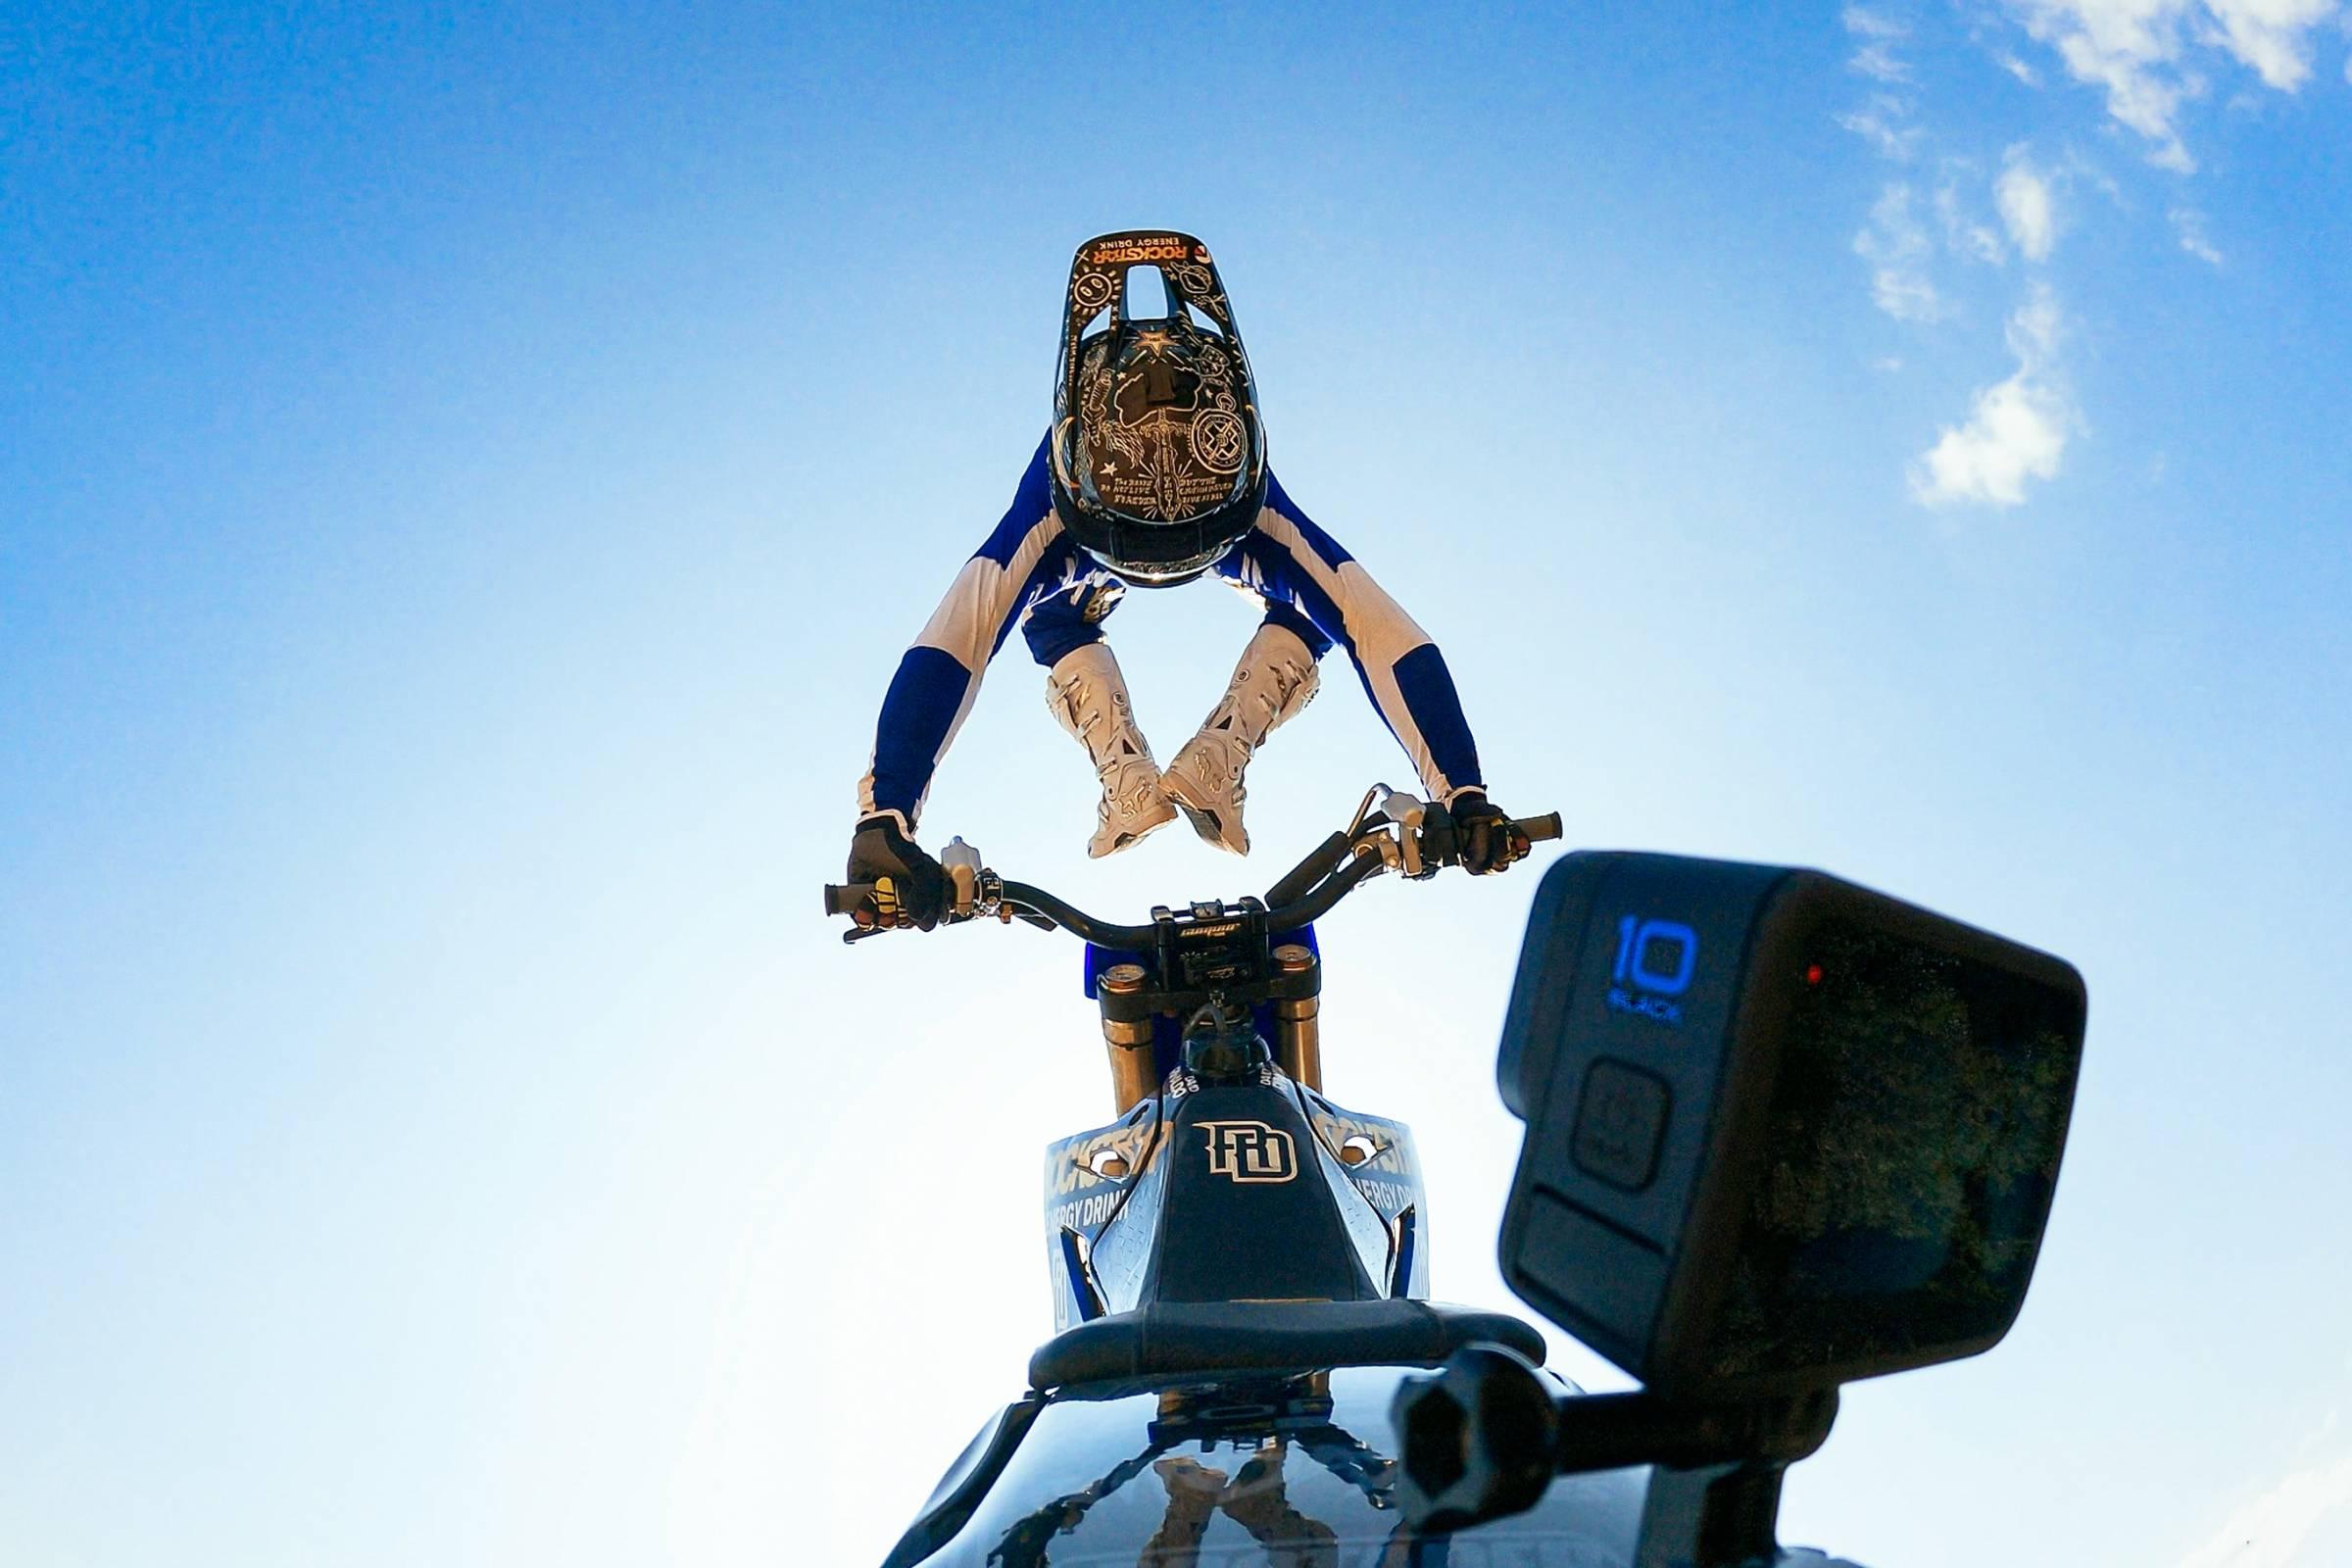 Moto rider back flipping with GoPro Hero10 Black